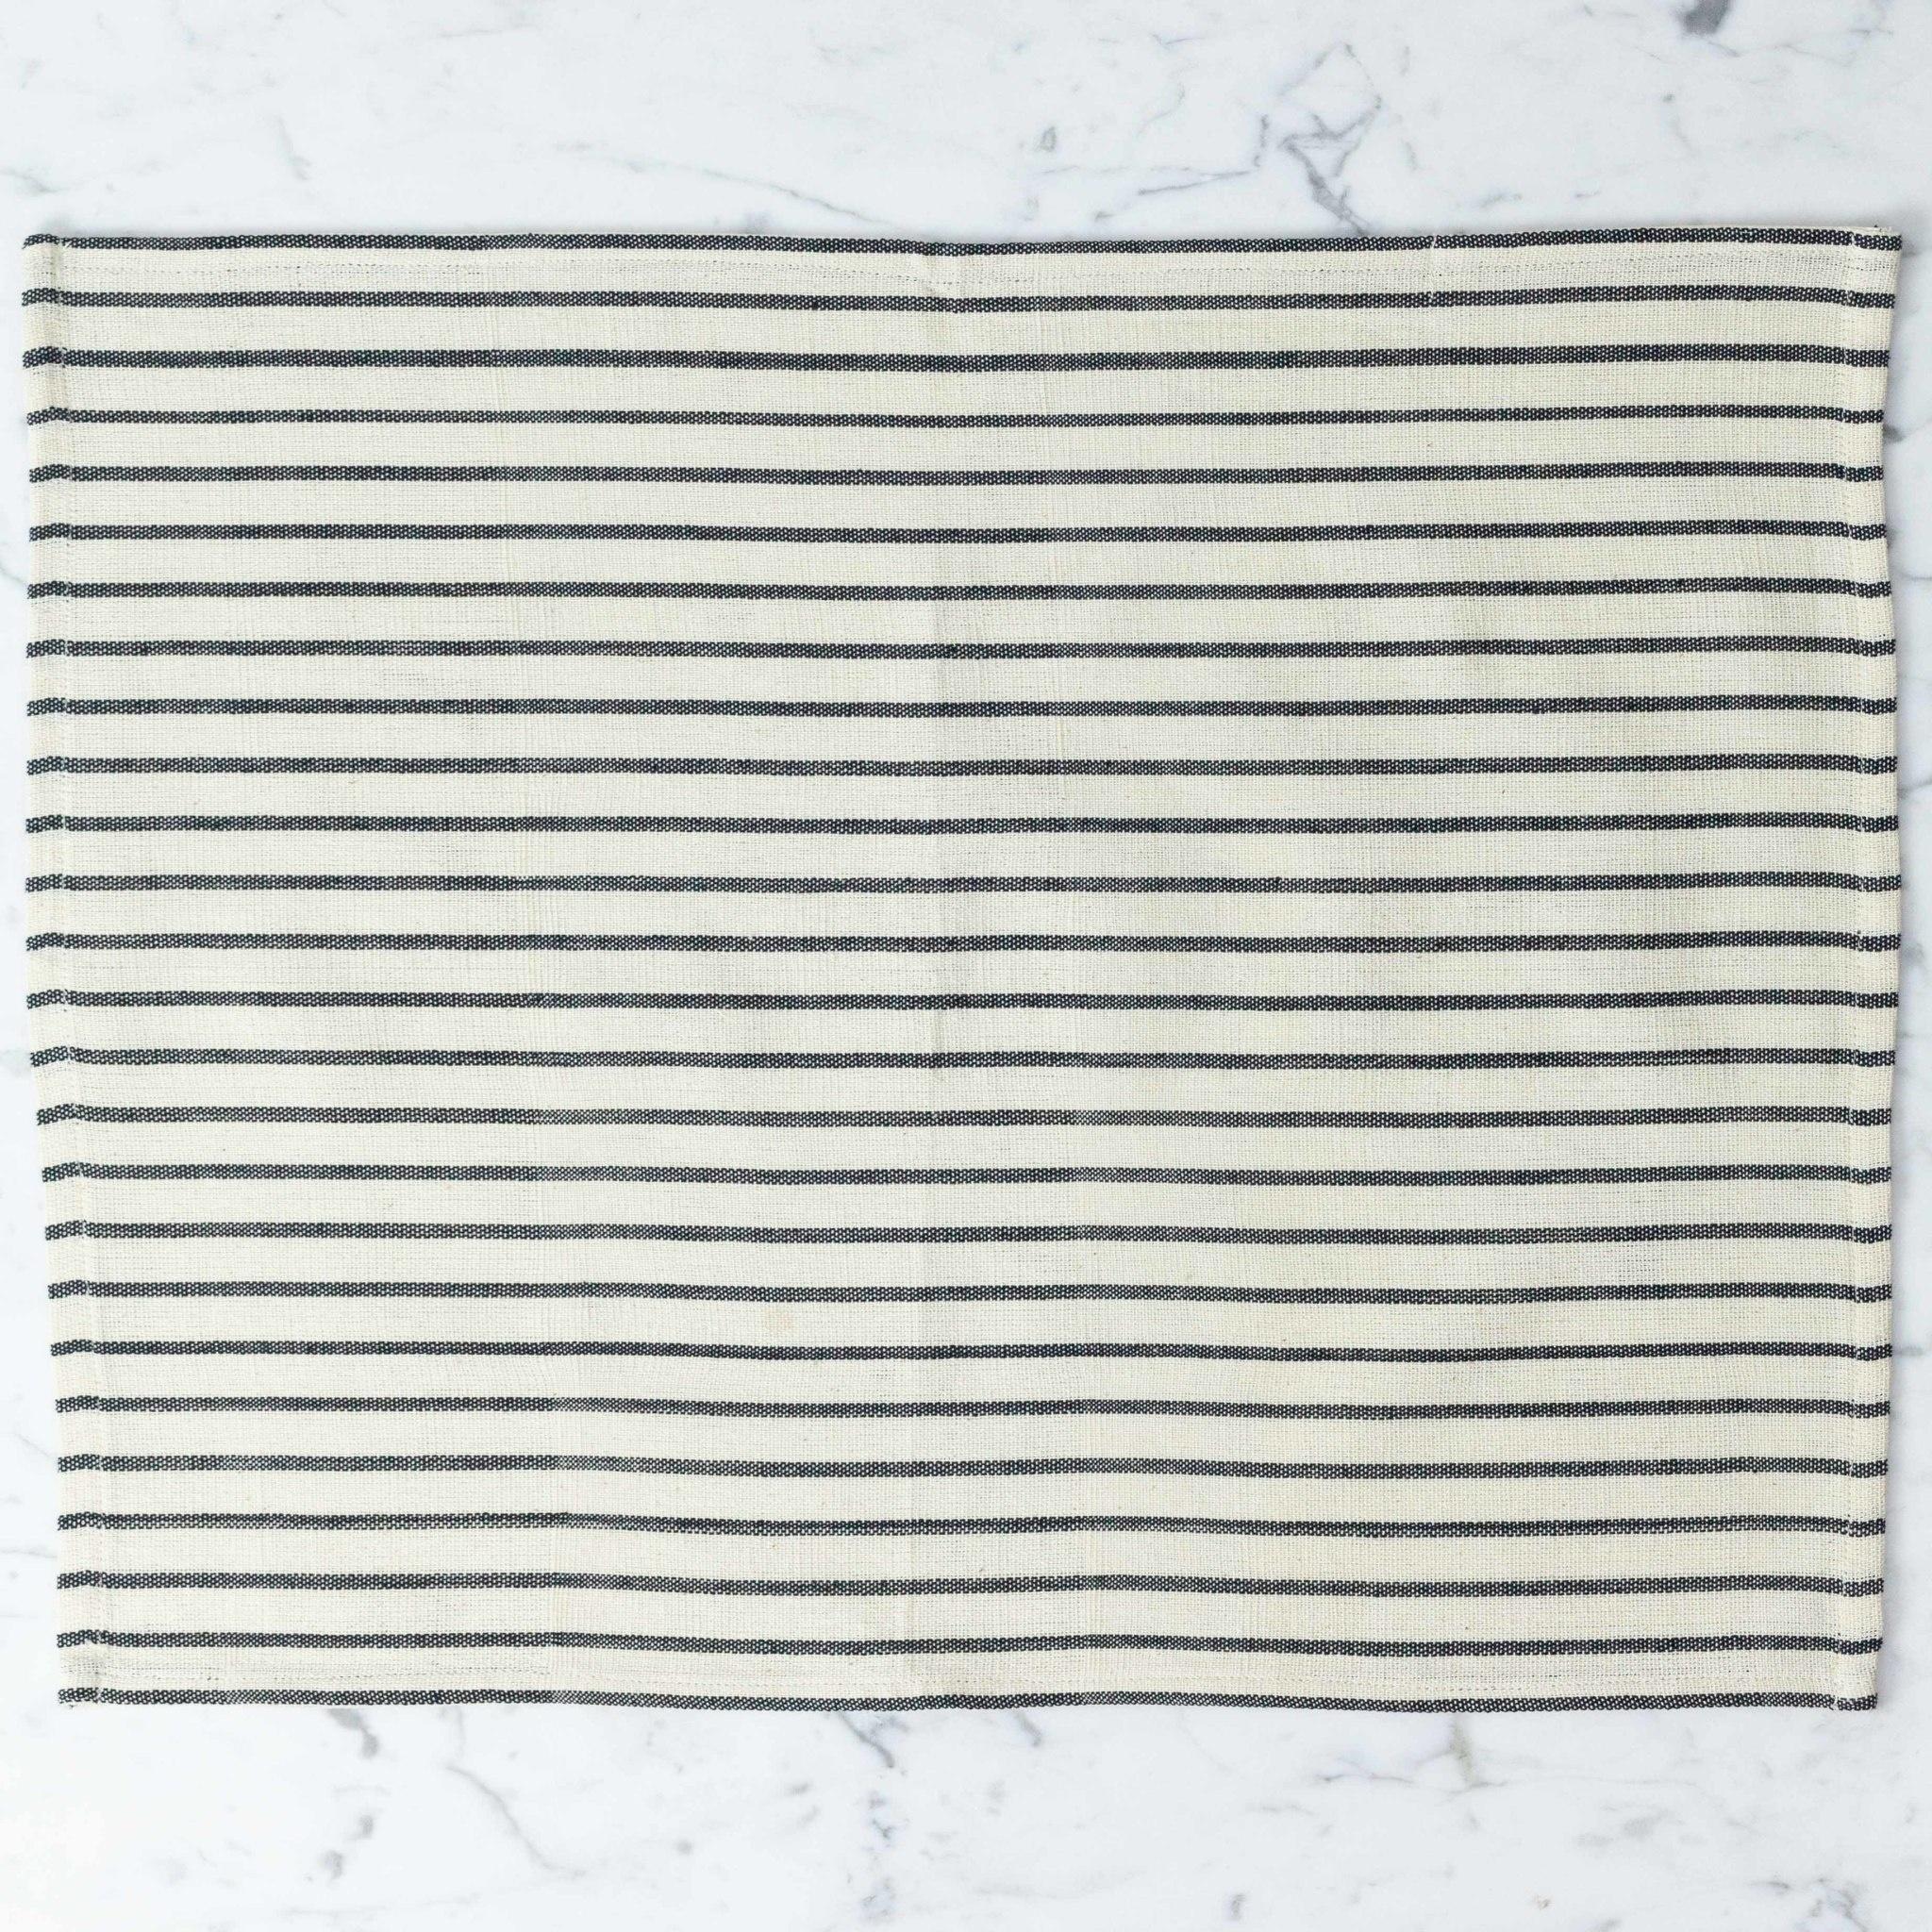 TENSIRA Handwoven Cotton Placemat - Off White with Slim Regular Black Stripe - 14 x 18 inch